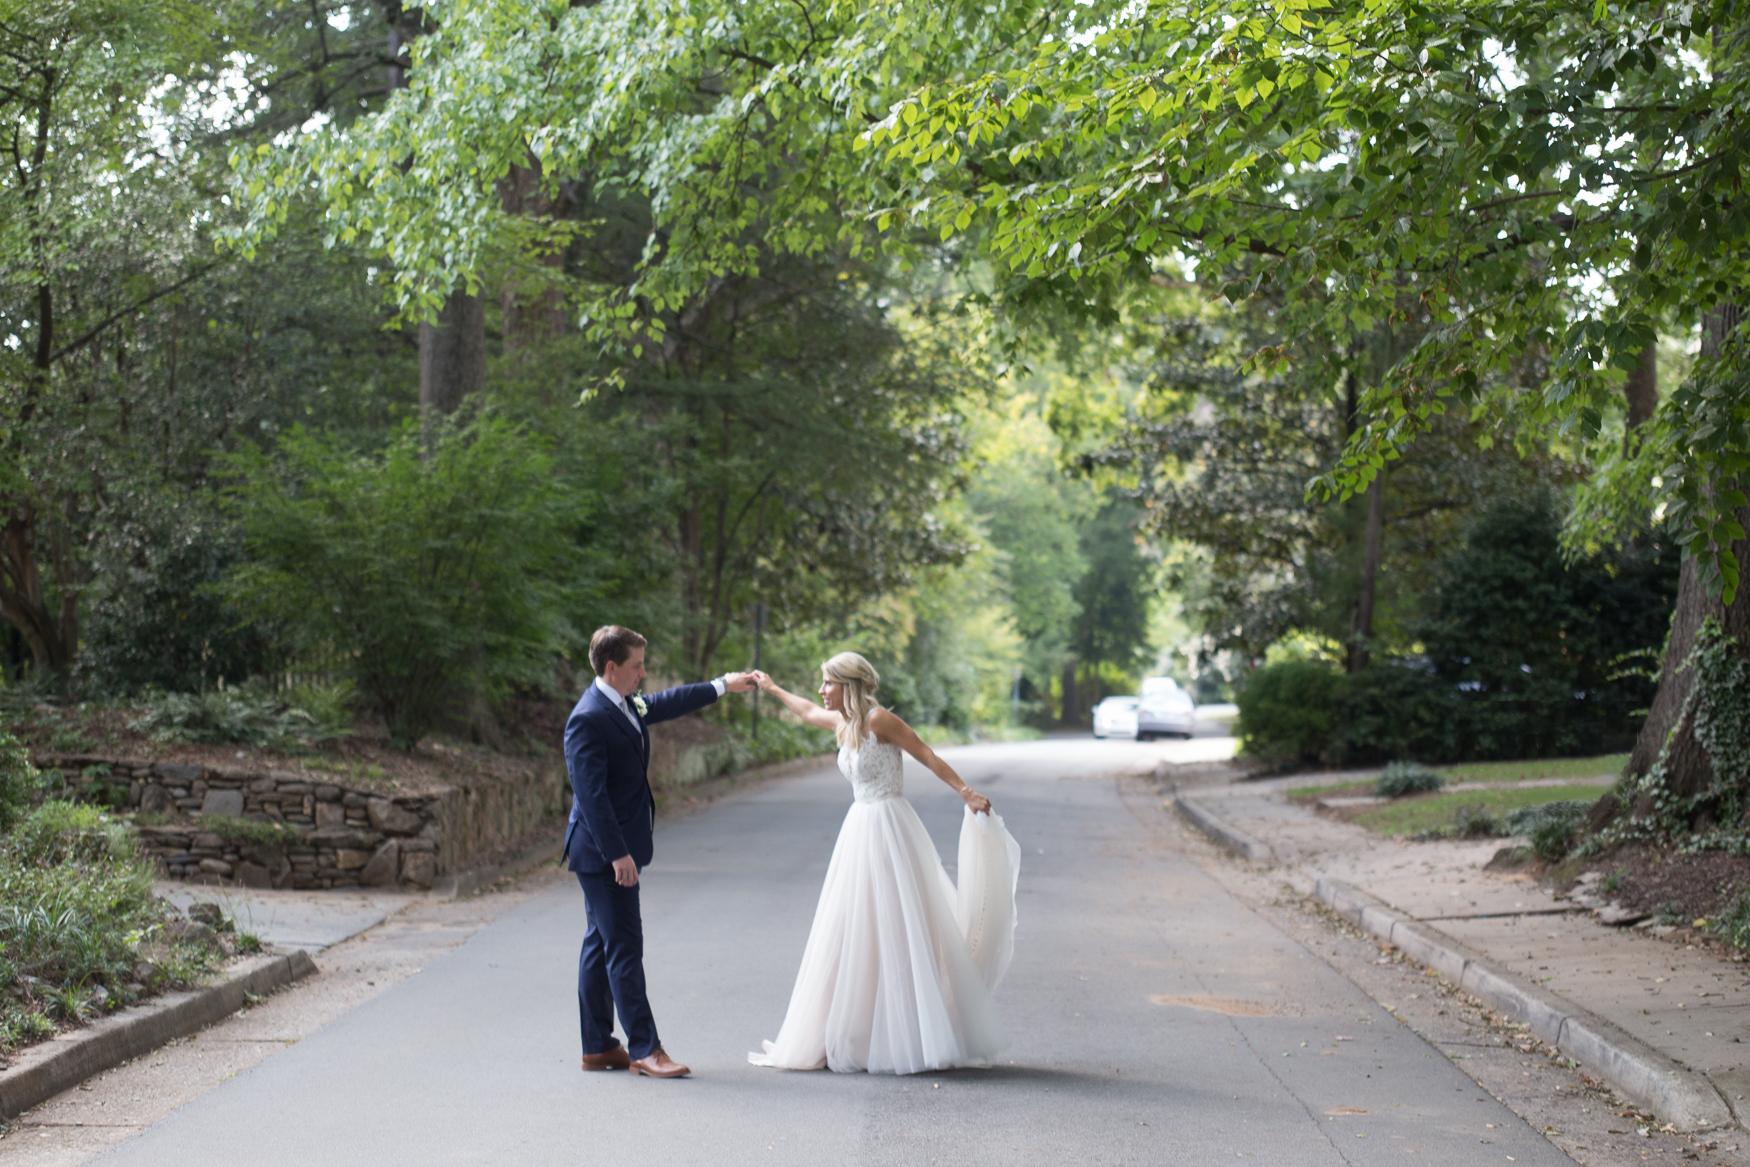 wedding--2 copy 3.jpg